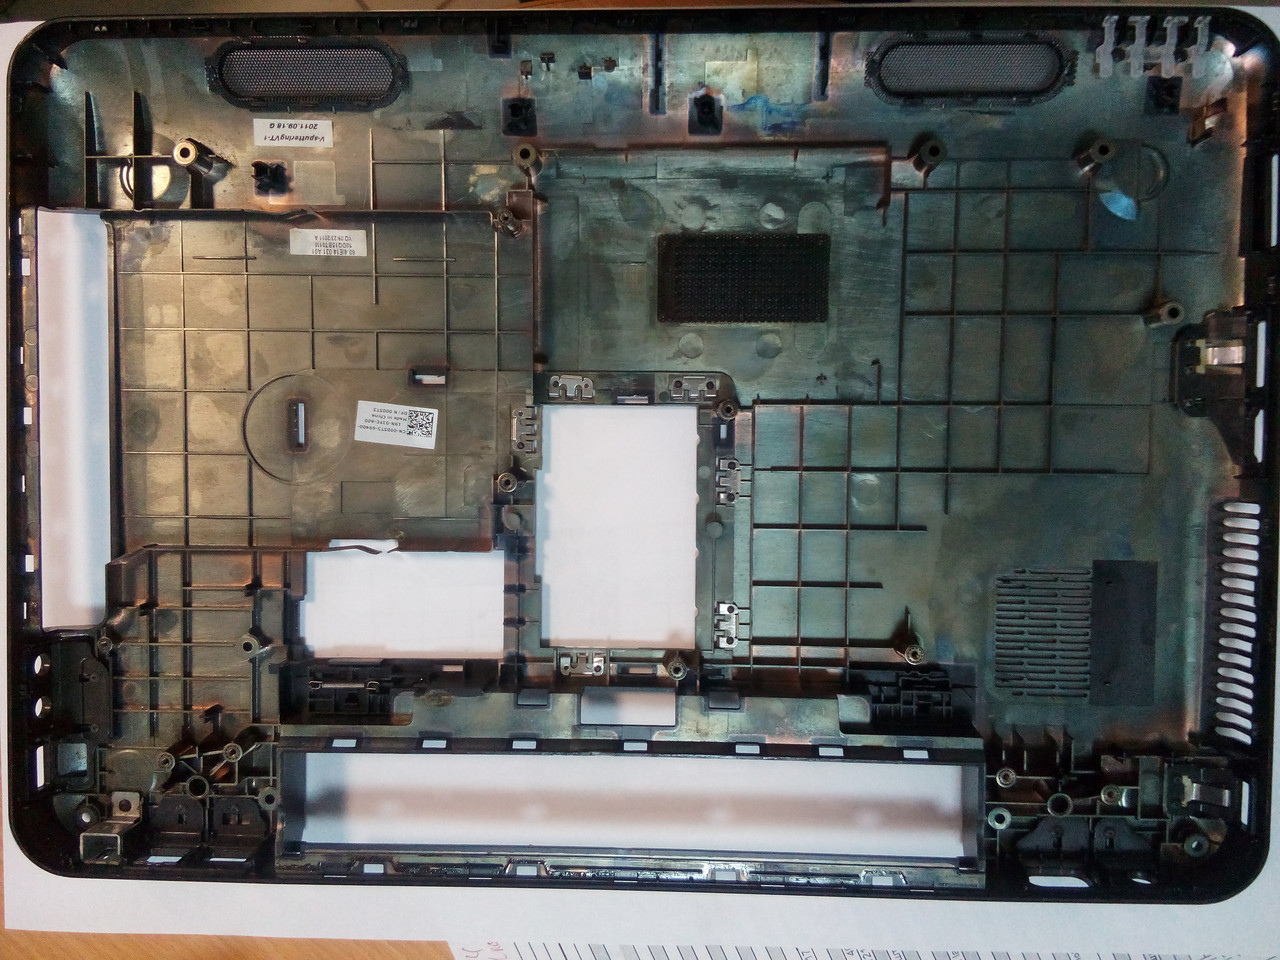 Нижняя часть корпуса ноутбука DELL Inspiron 15R N5110 M5110 CN-005T5-69400-19N-02FC-A00 0005T5